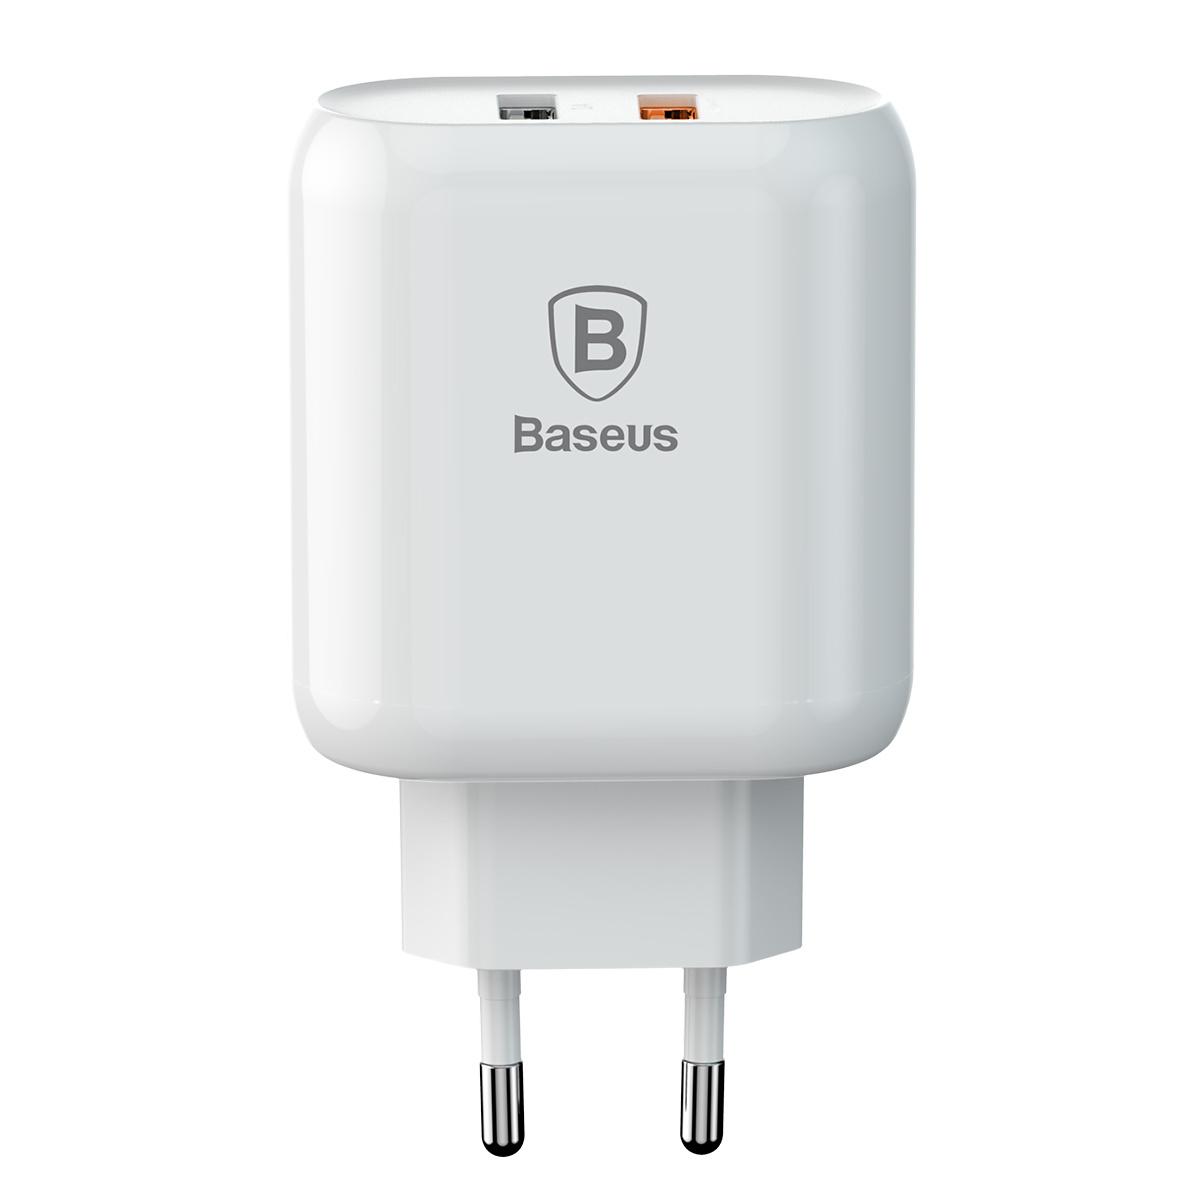 Baseus Bojure Series Dual-USB, QC3.0, 18W, vit